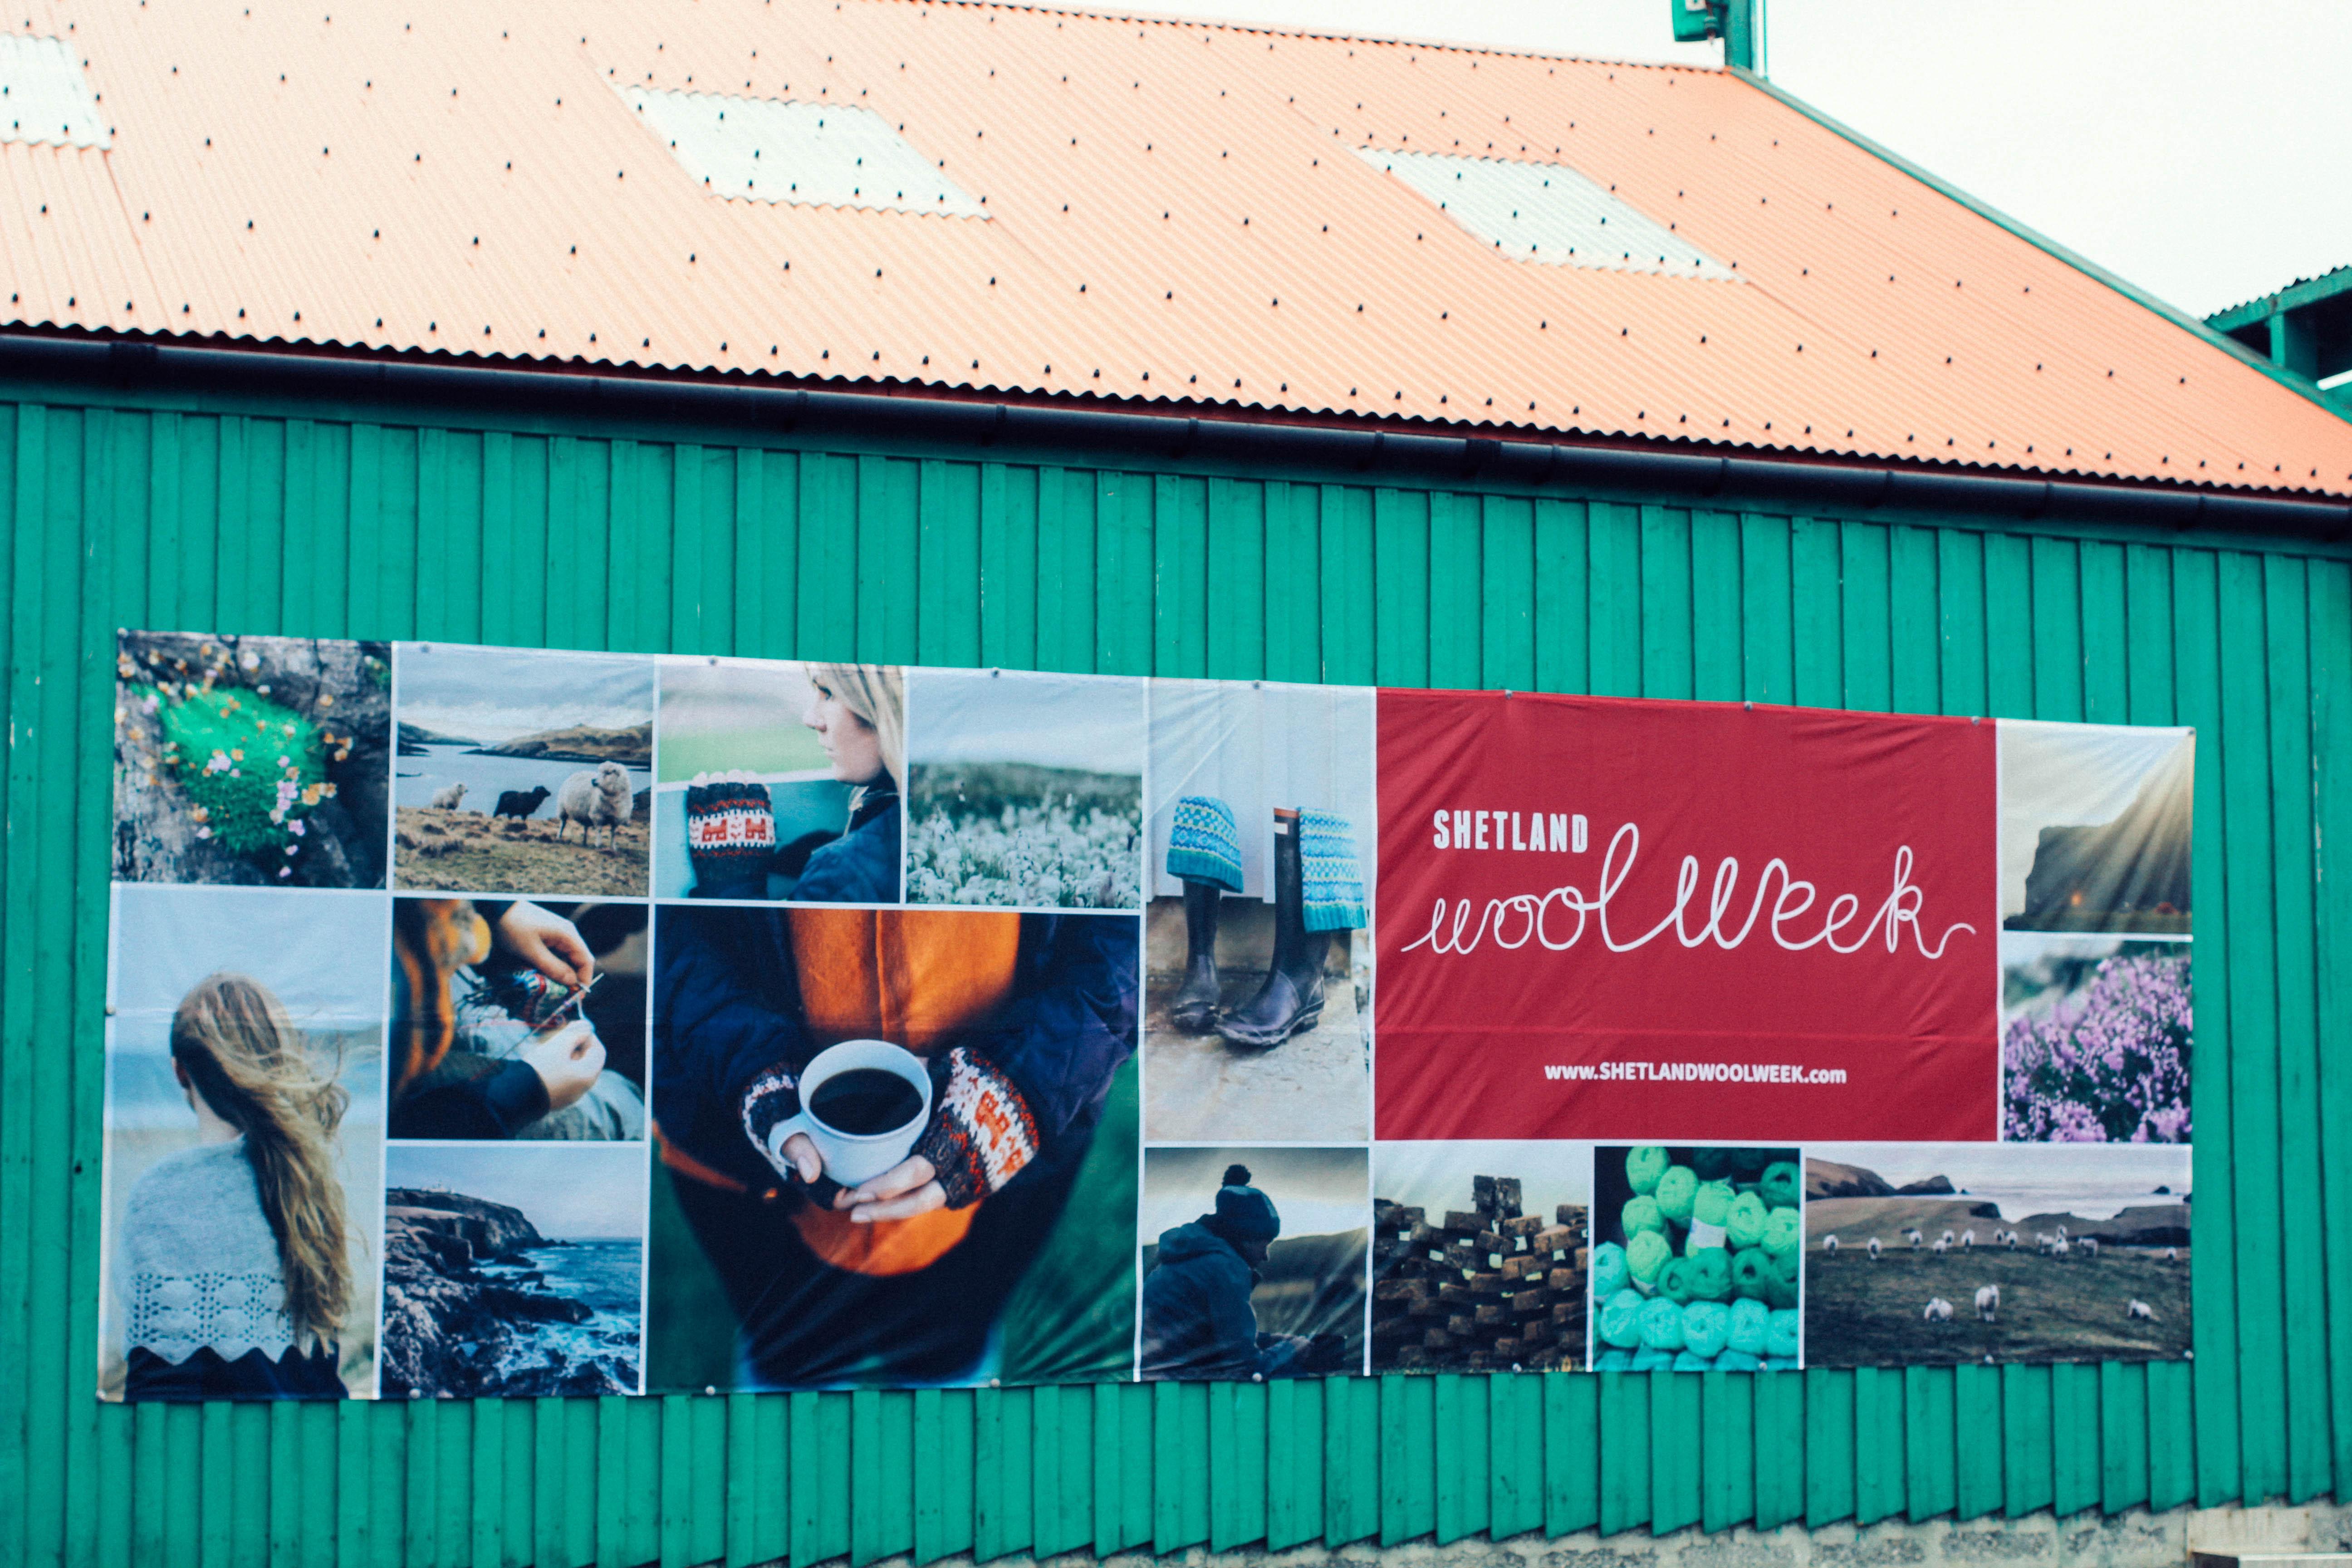 Shetland Wool Week 2016